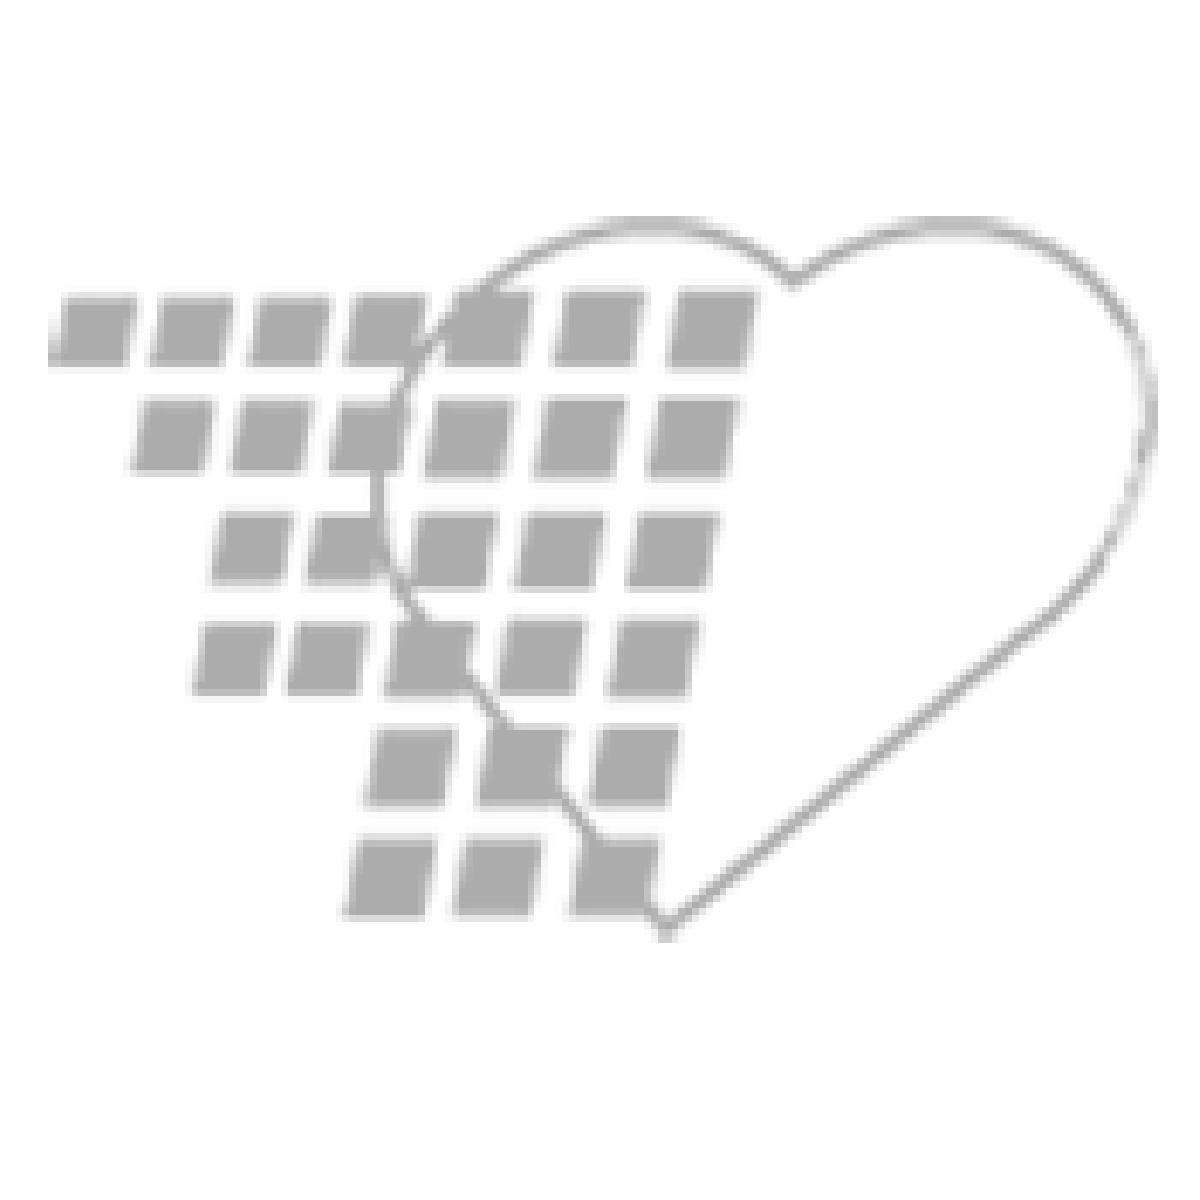 09-31-9982 Pregnancy Wheel and Ovulation Calendar